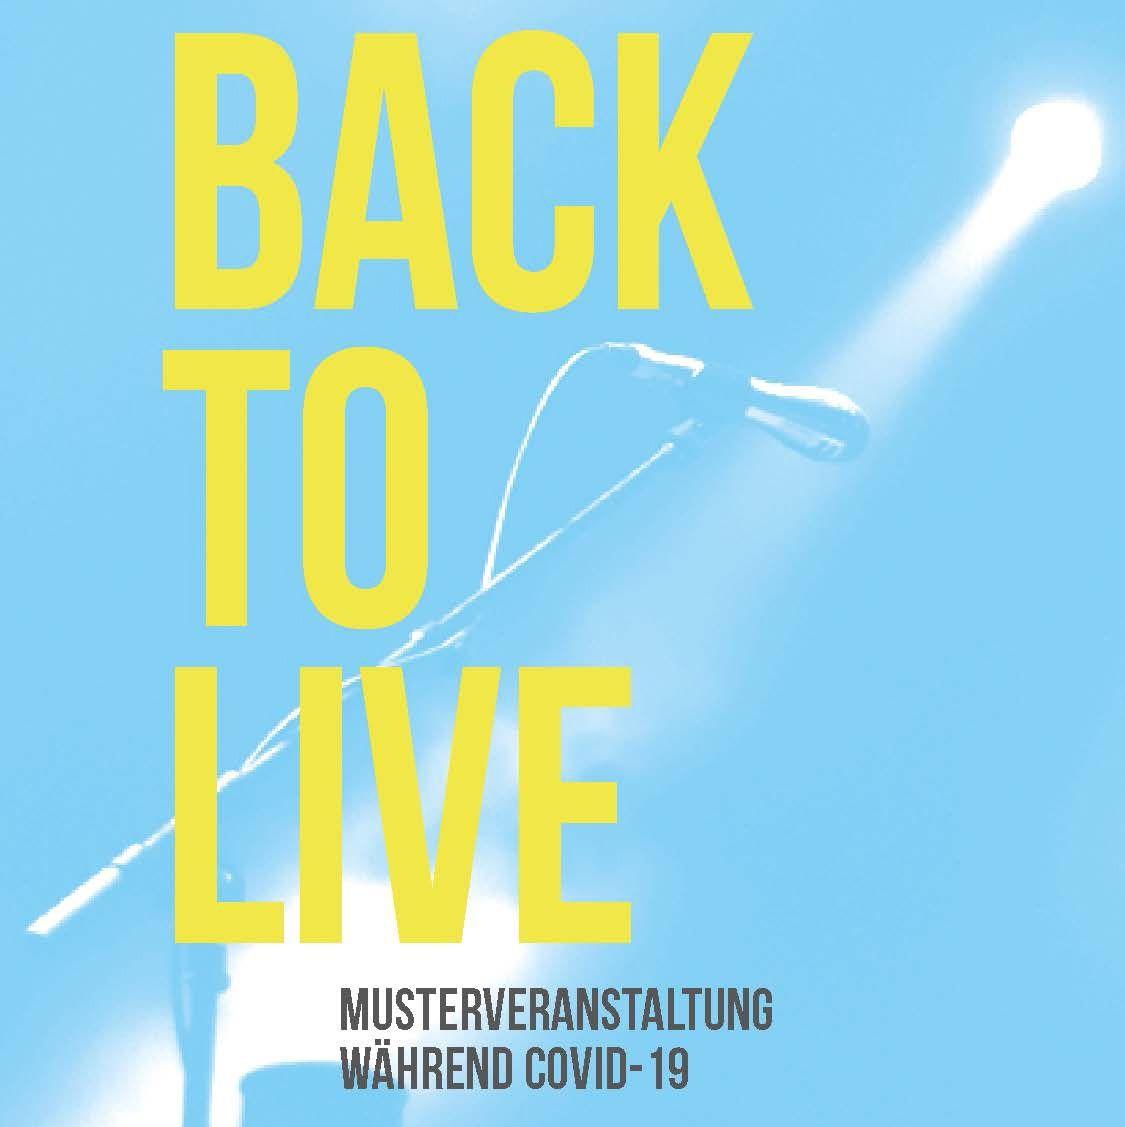 BACK TO LIVE: Events trotz COVID-19 – der FAMAB zeigt in seinem Labor wie's geht.